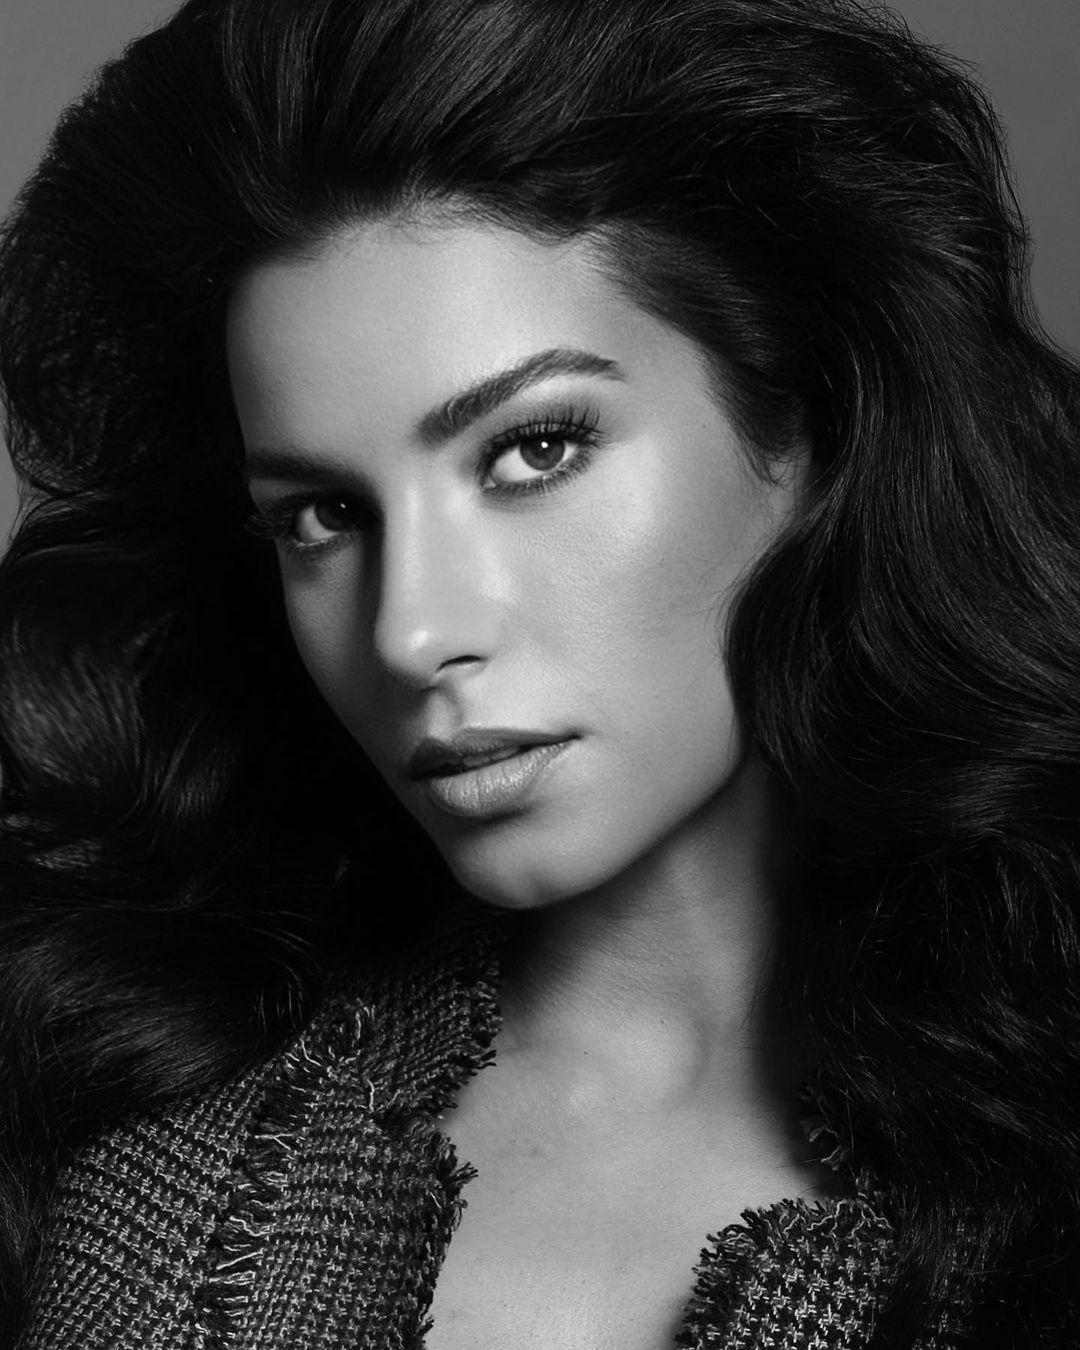 julia gama, miss brasil universo 2020/top 11 de miss world 2014. part I. - Página 74 Munhe949